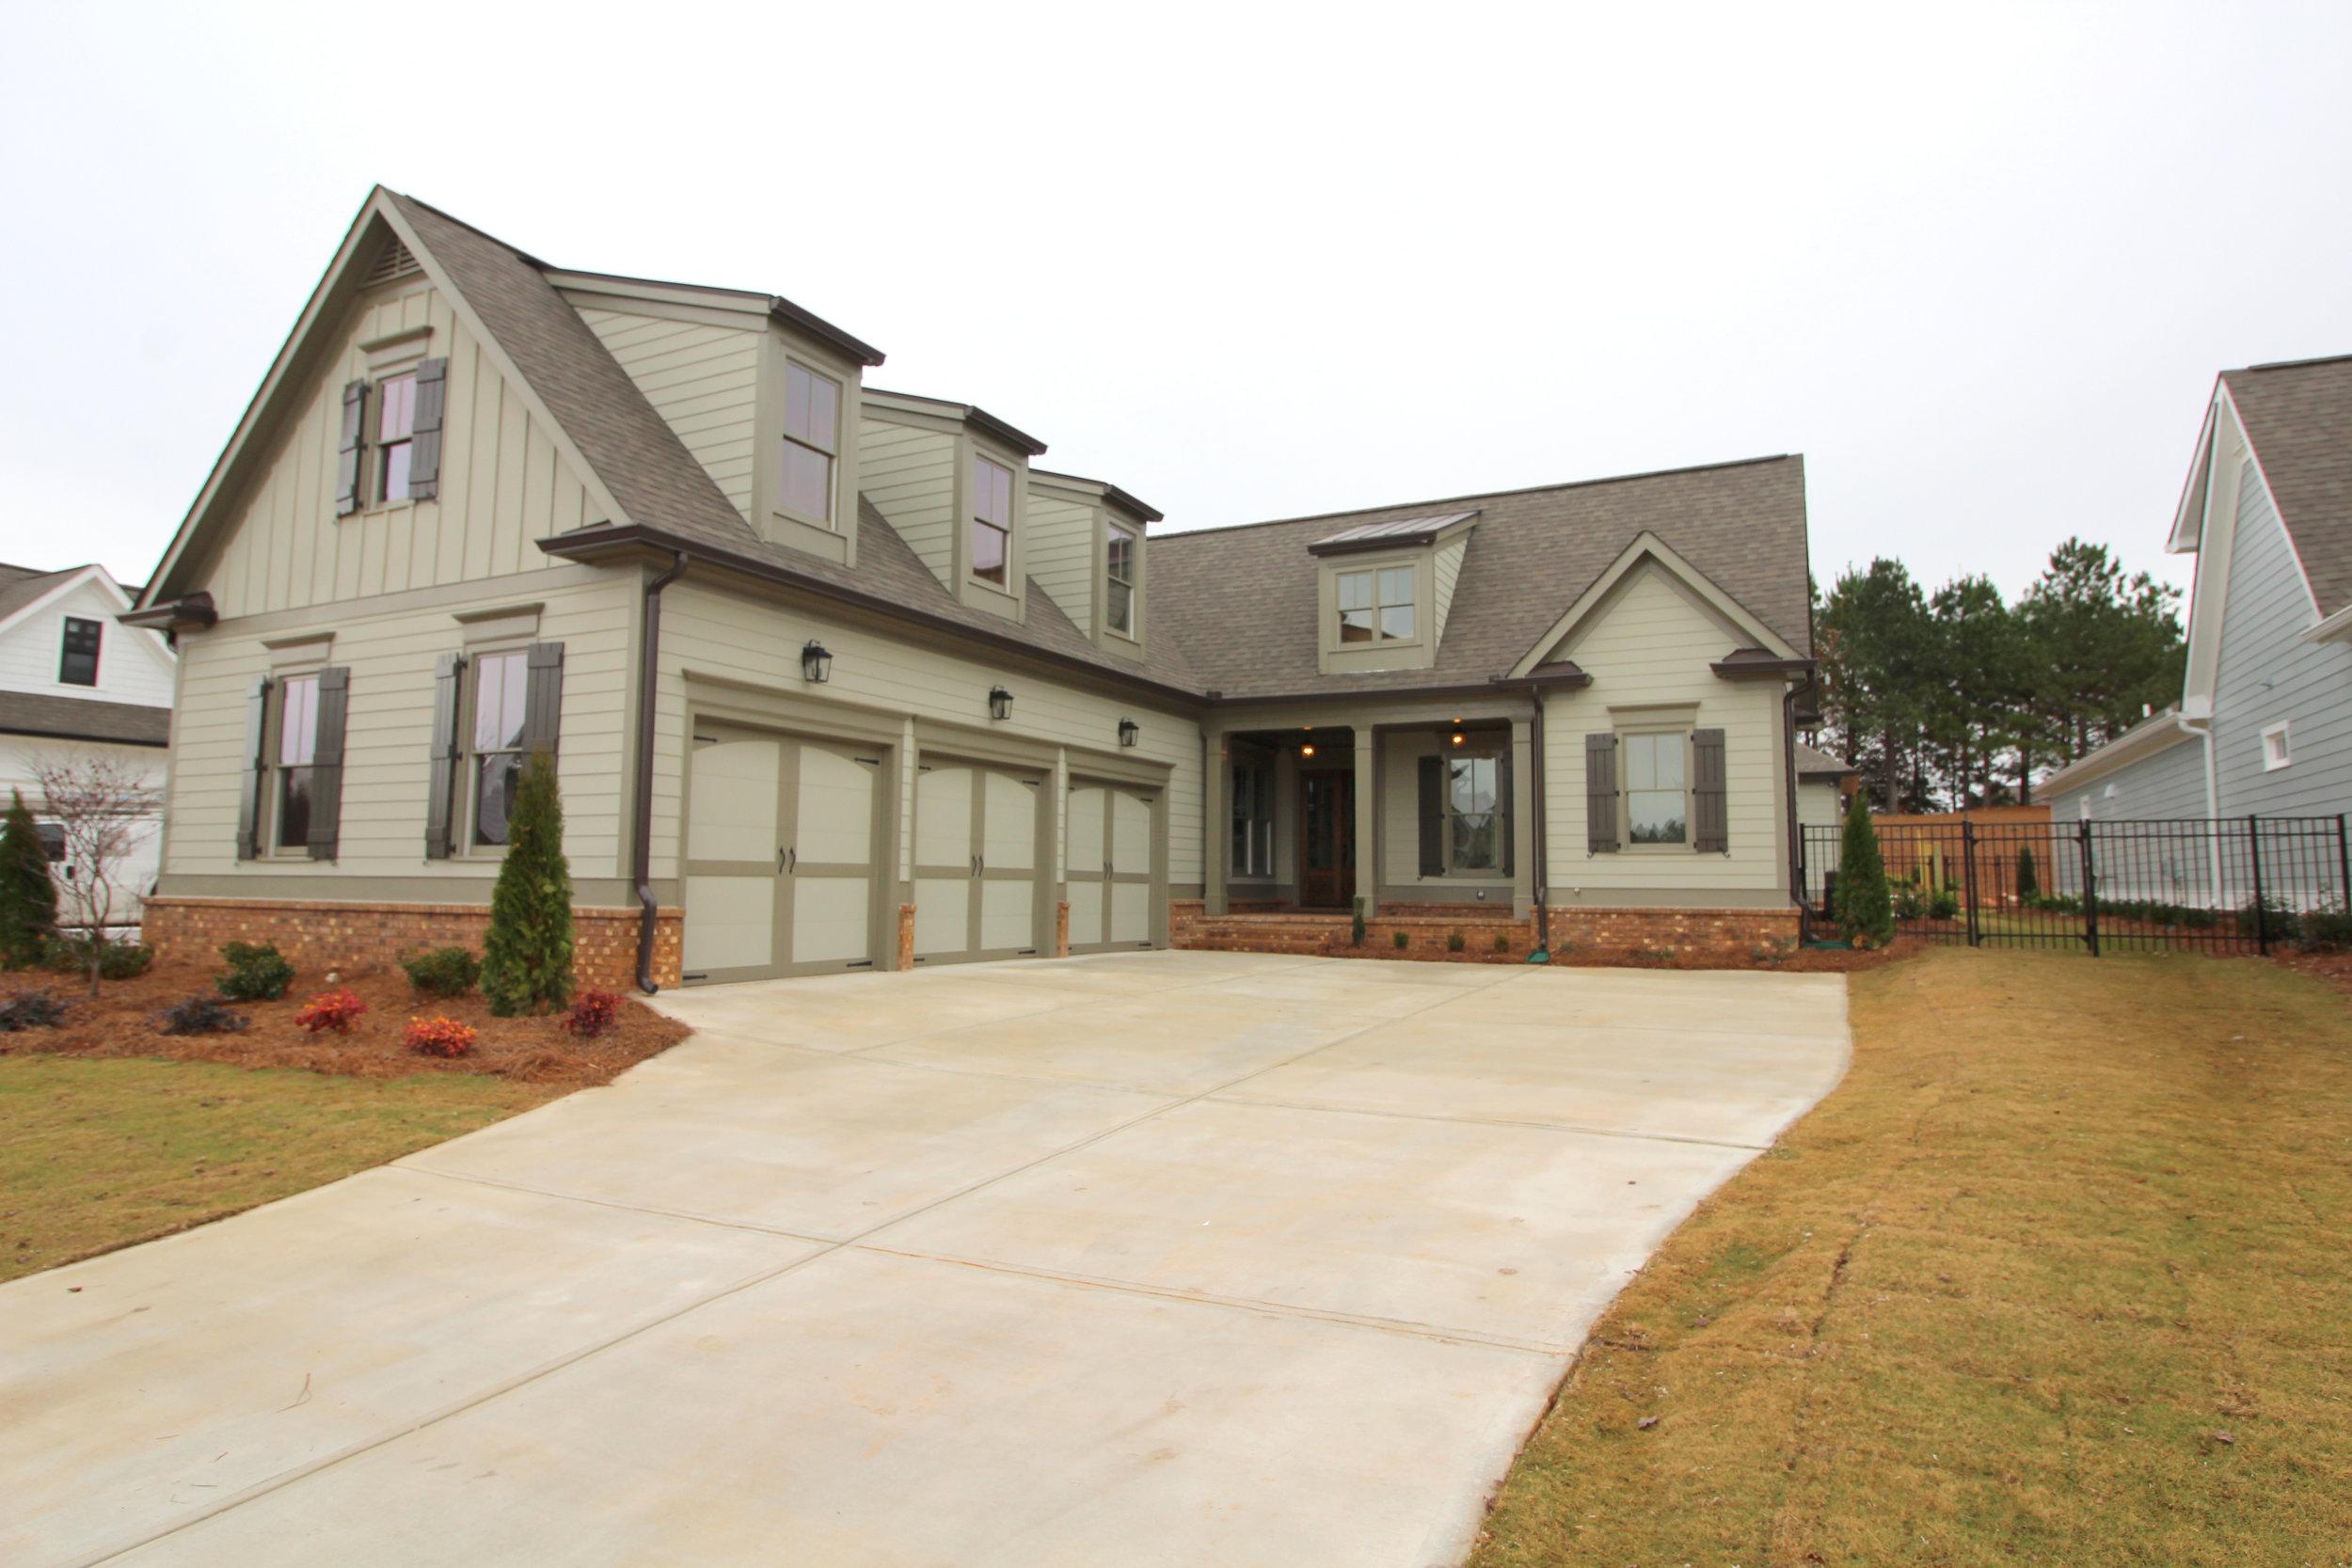 model-home-1756-greenleffe-drive-statham-ga-30666-the-georgia-club-oconee-county-oconee-springs-athens-area-home-for-sale-courtyard-homes.JPG